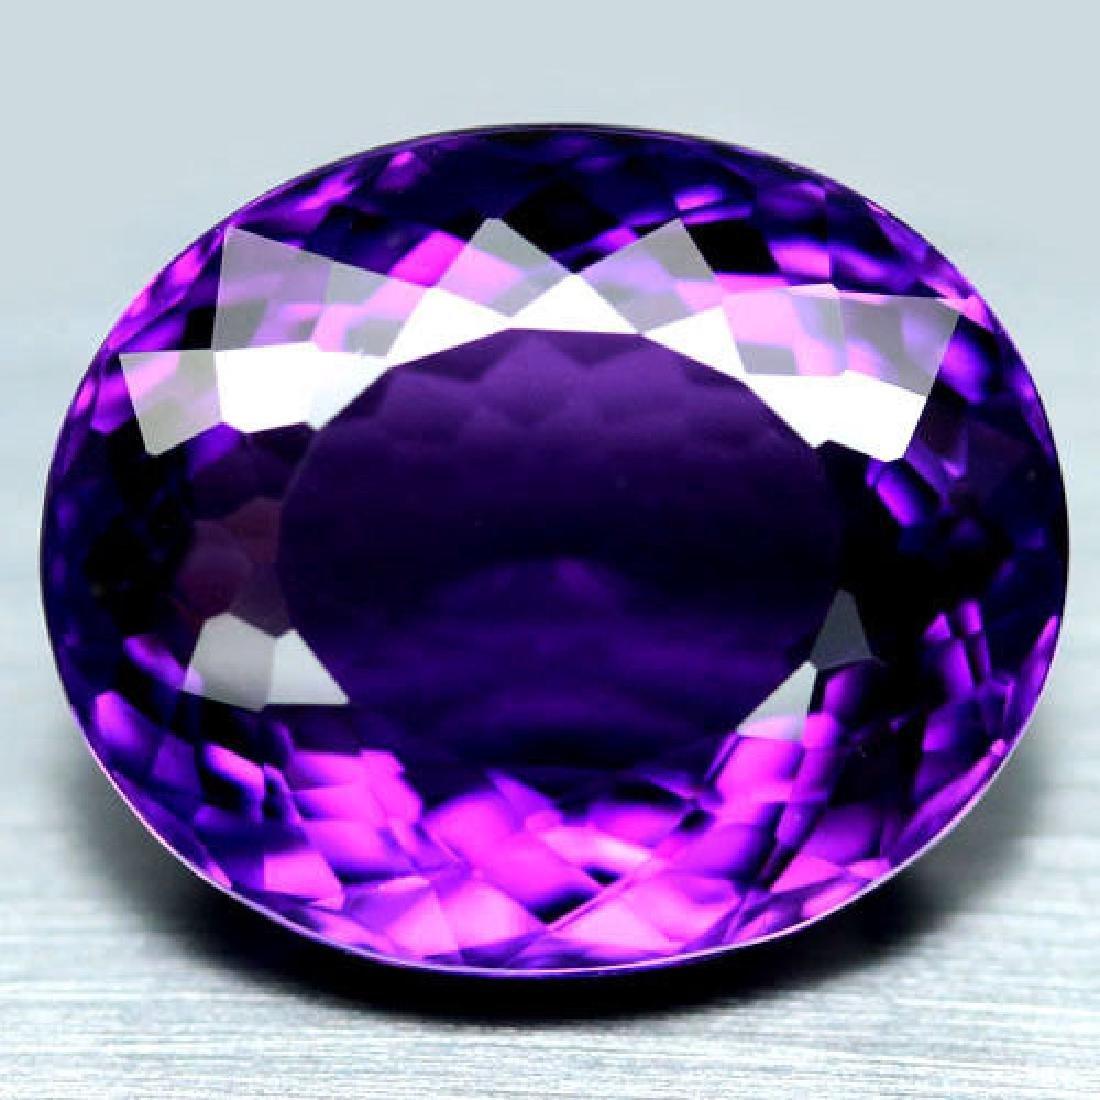 Natural Color Changing Amethyst 301 carats